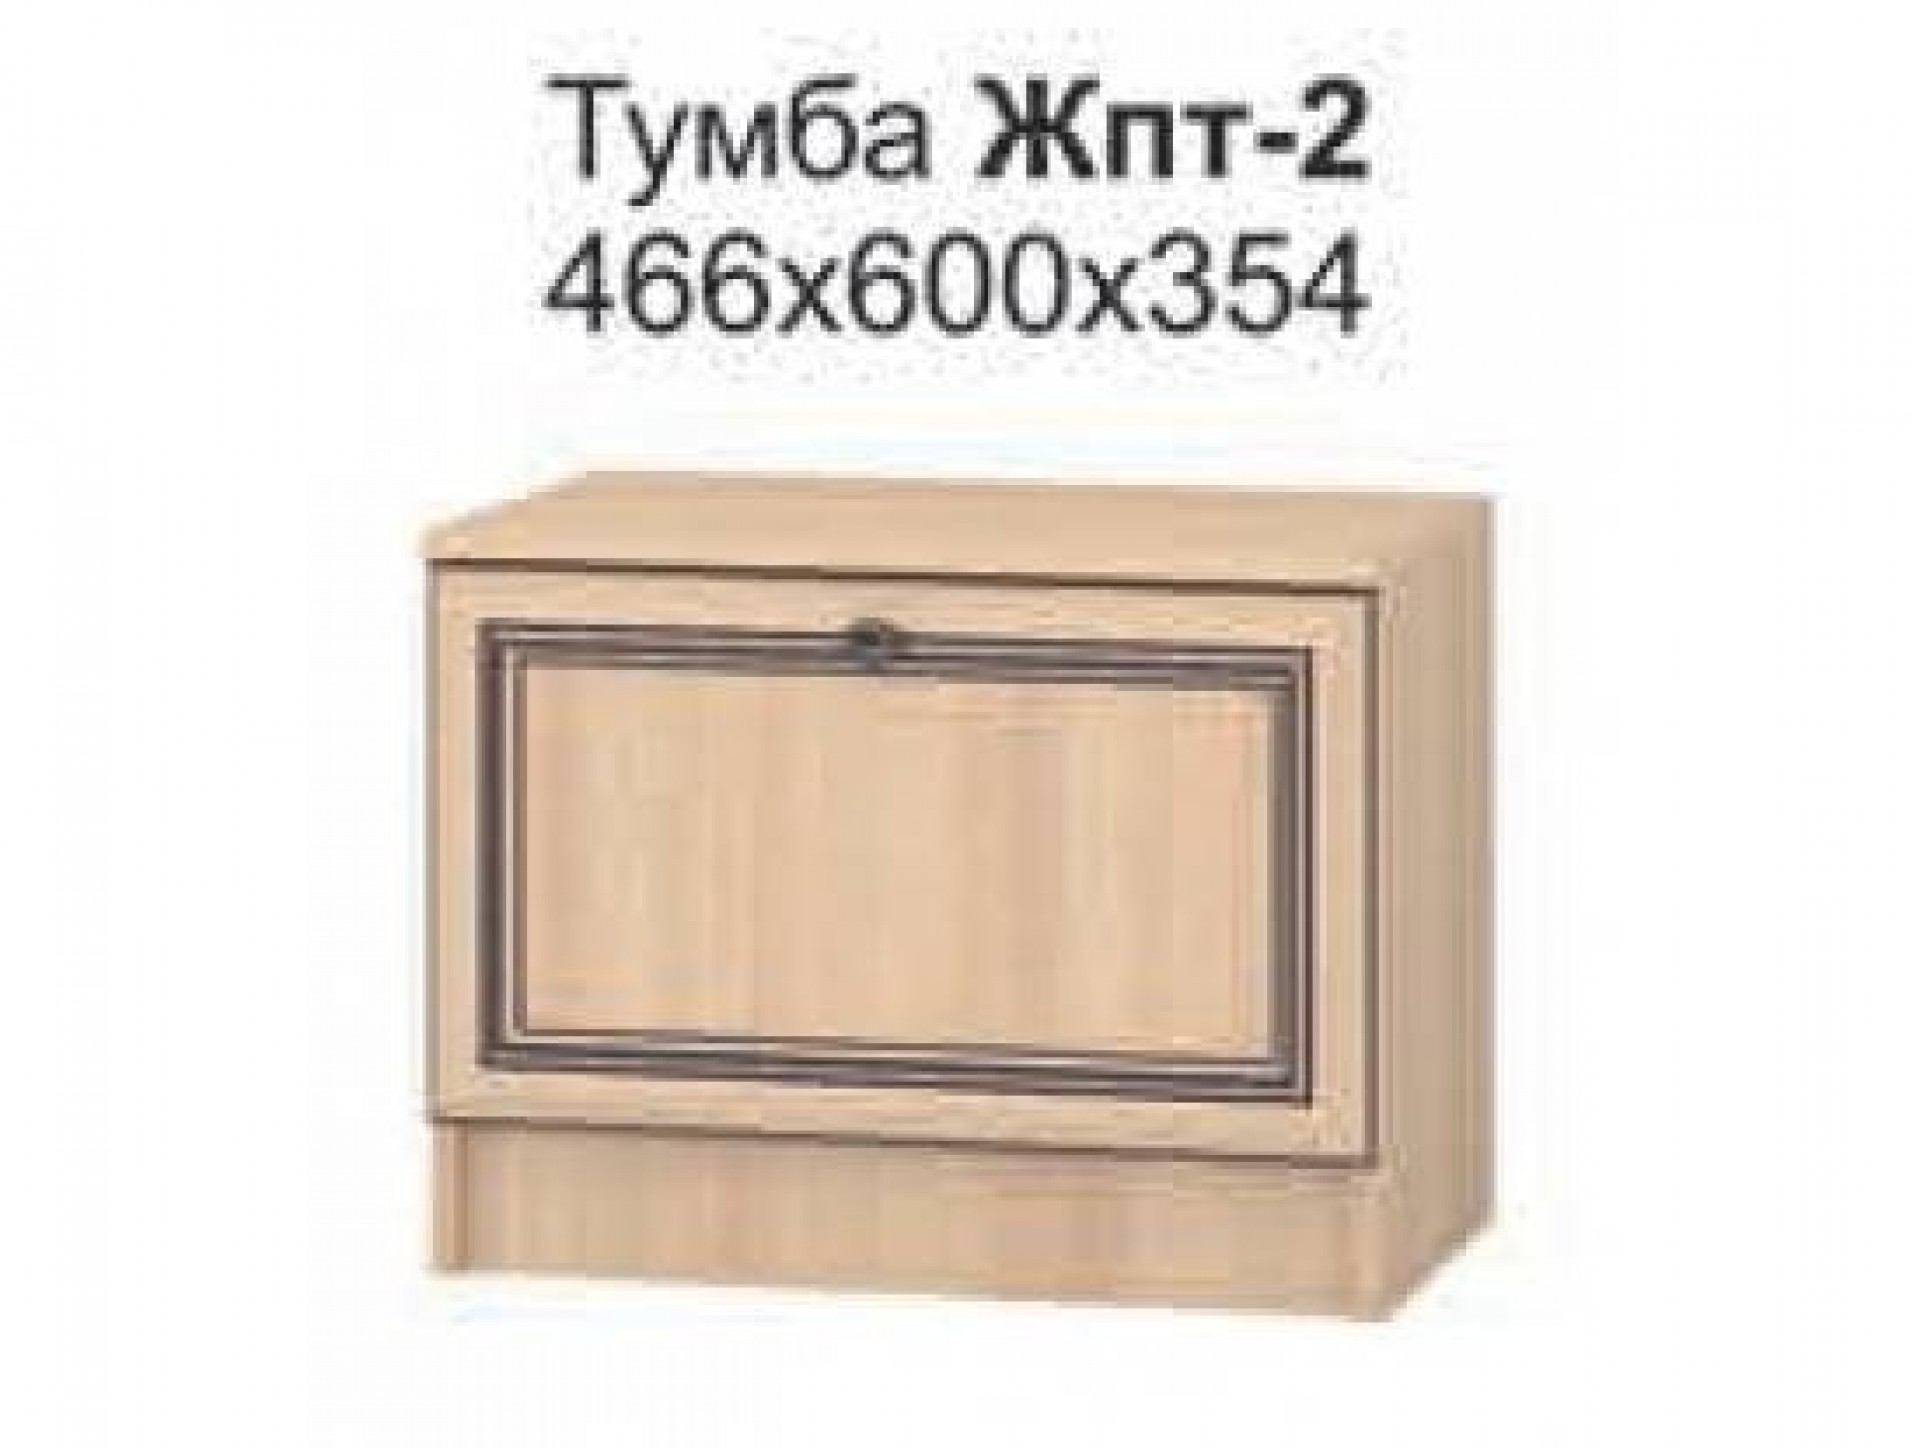 "Тумба ЖПТ-2 ""Жасмин"" приобрести в Томске"